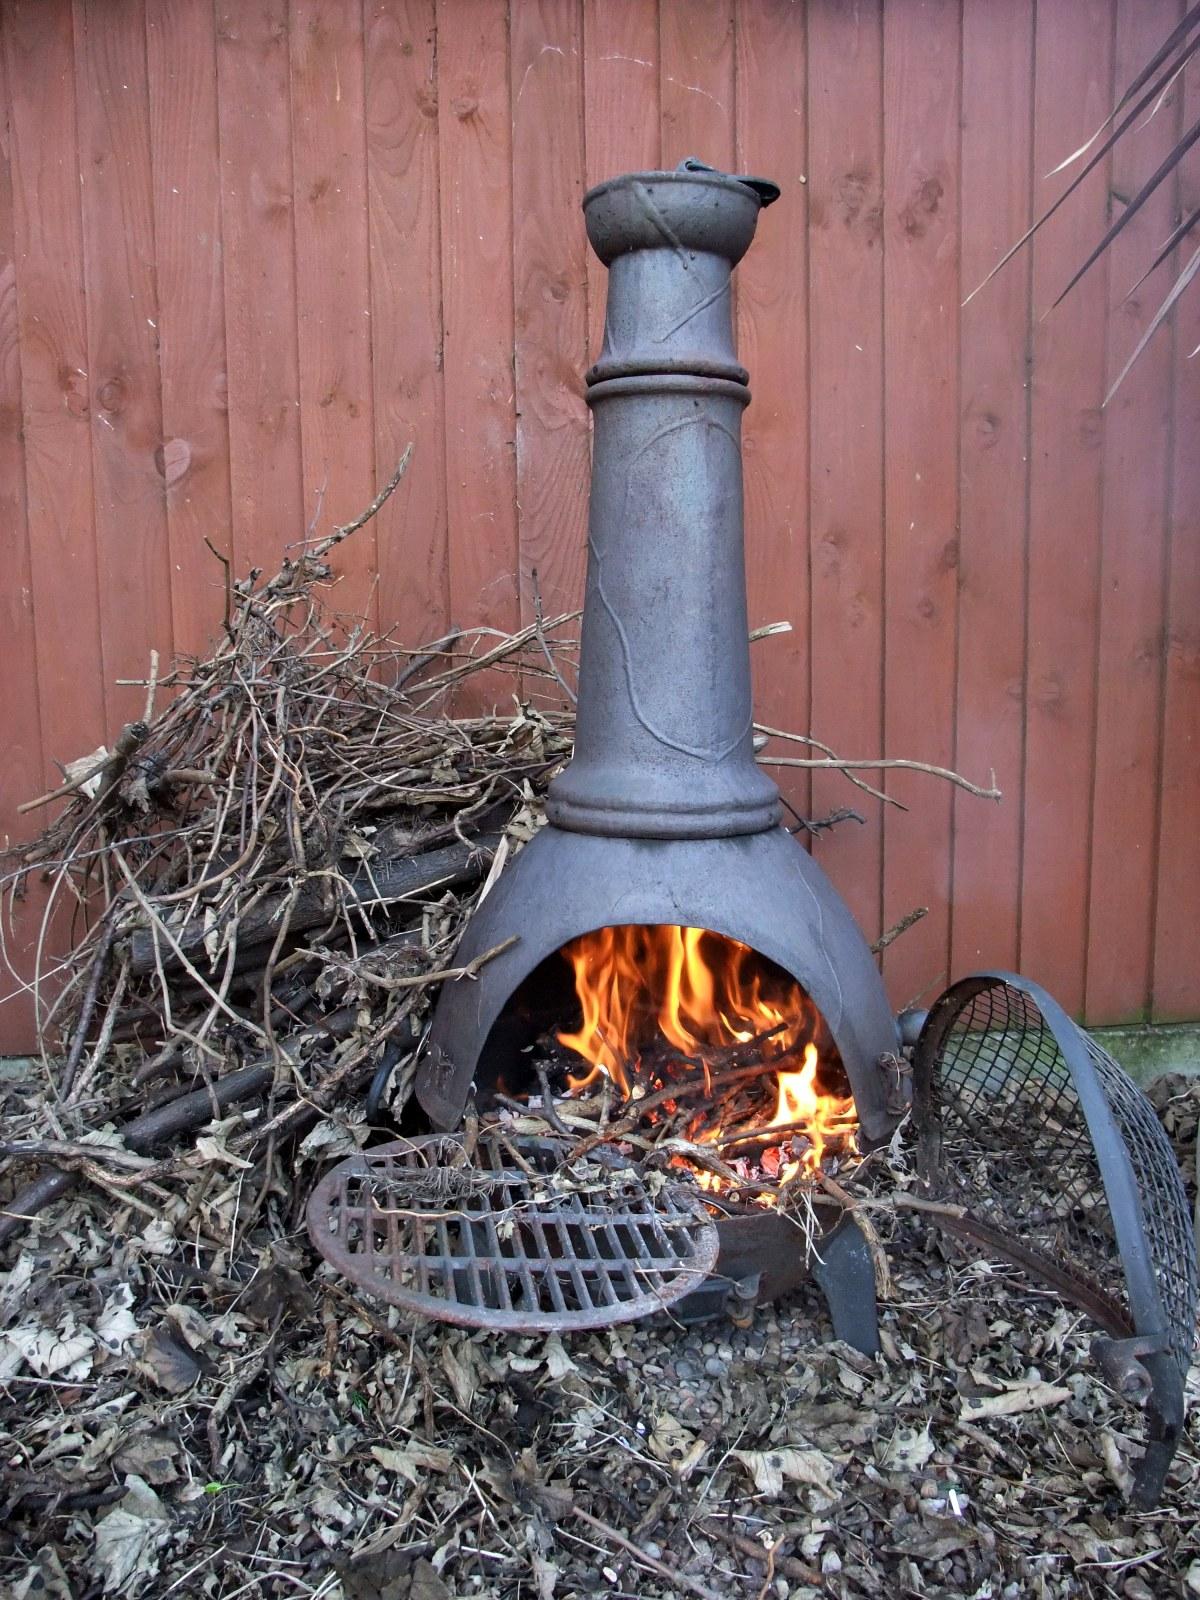 Chimnea ablaze